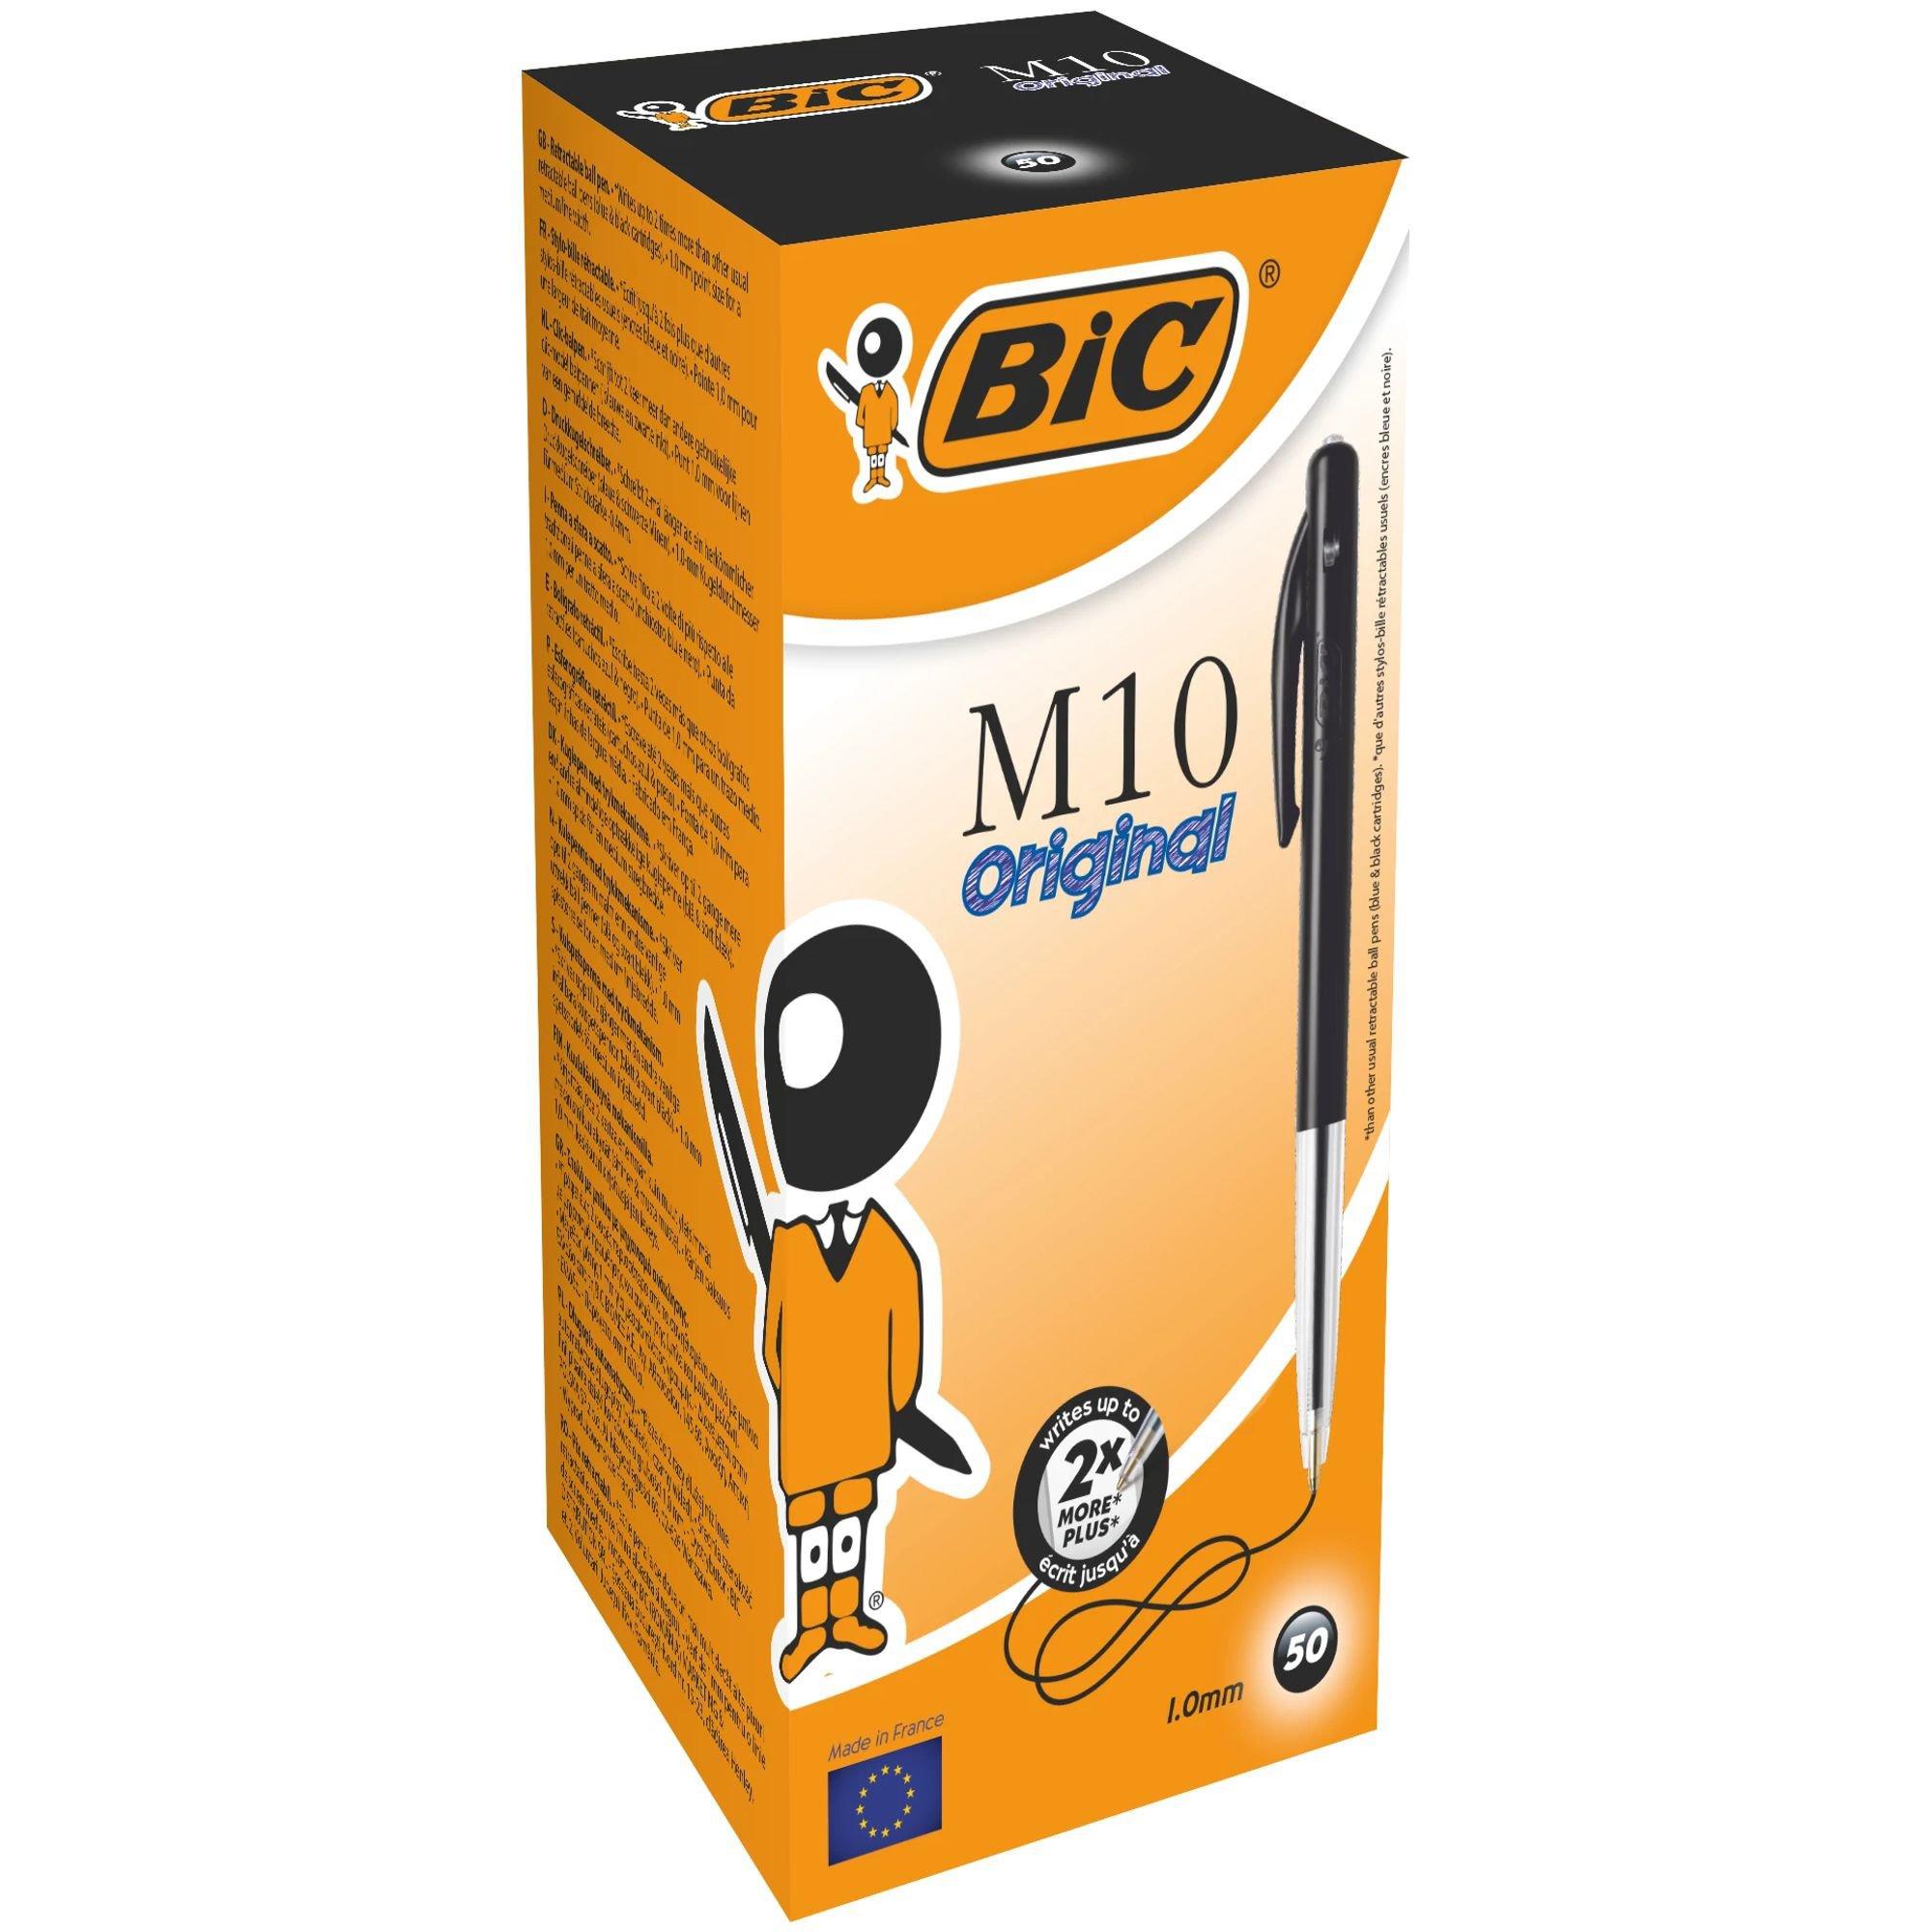 Image for BIC M10 Clic Retractable Ballpoint Pen Black 1199190125